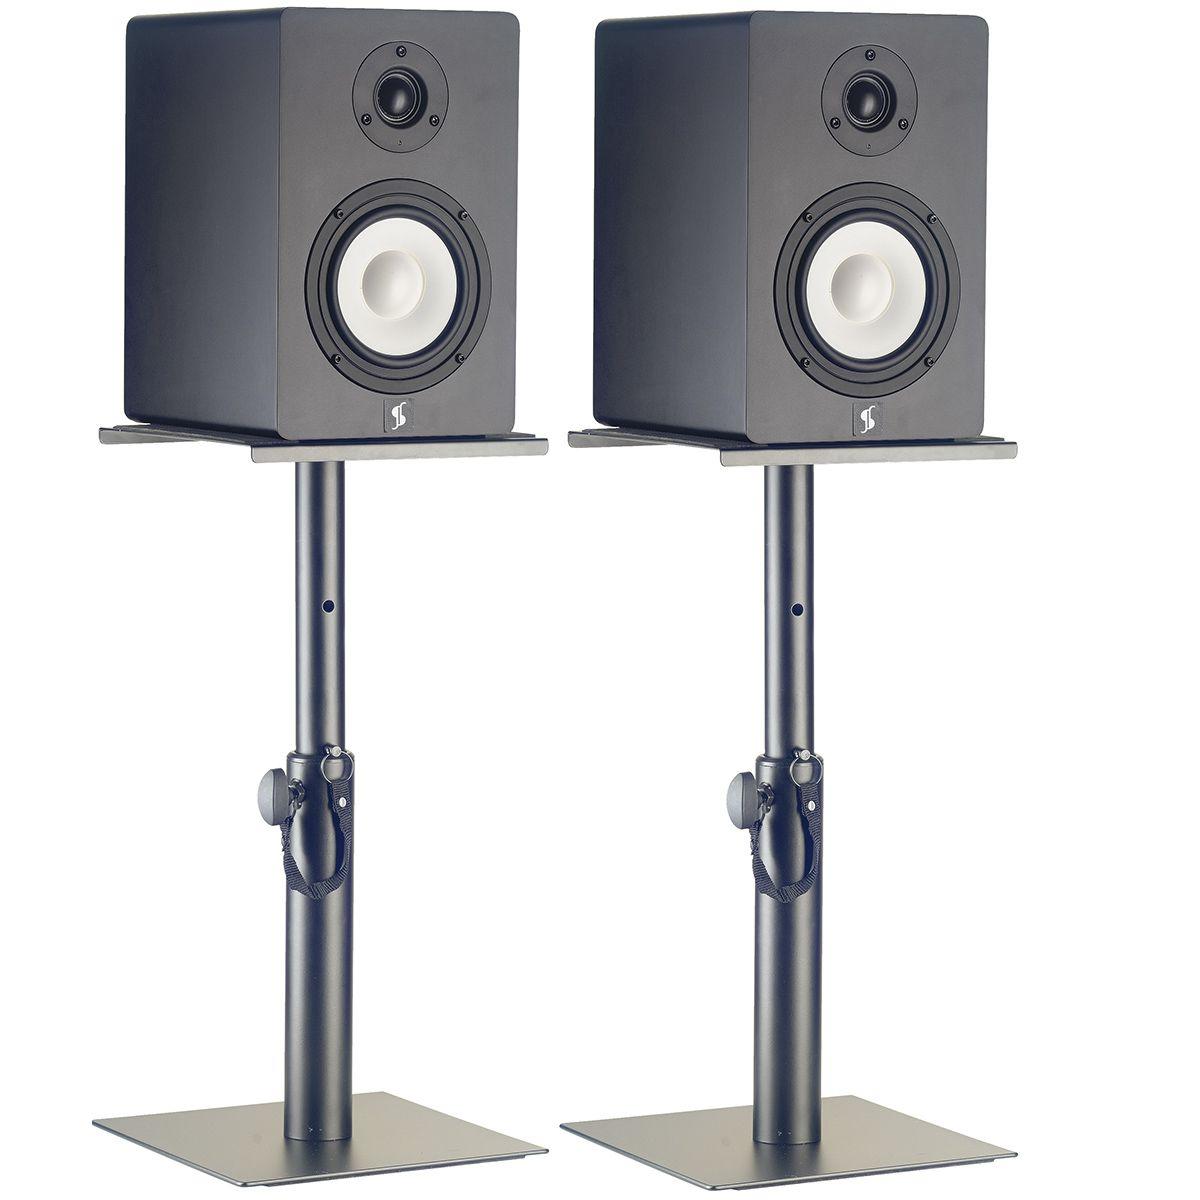 Suporte Stagg SMOS-05 Set para Monitores de Referencia